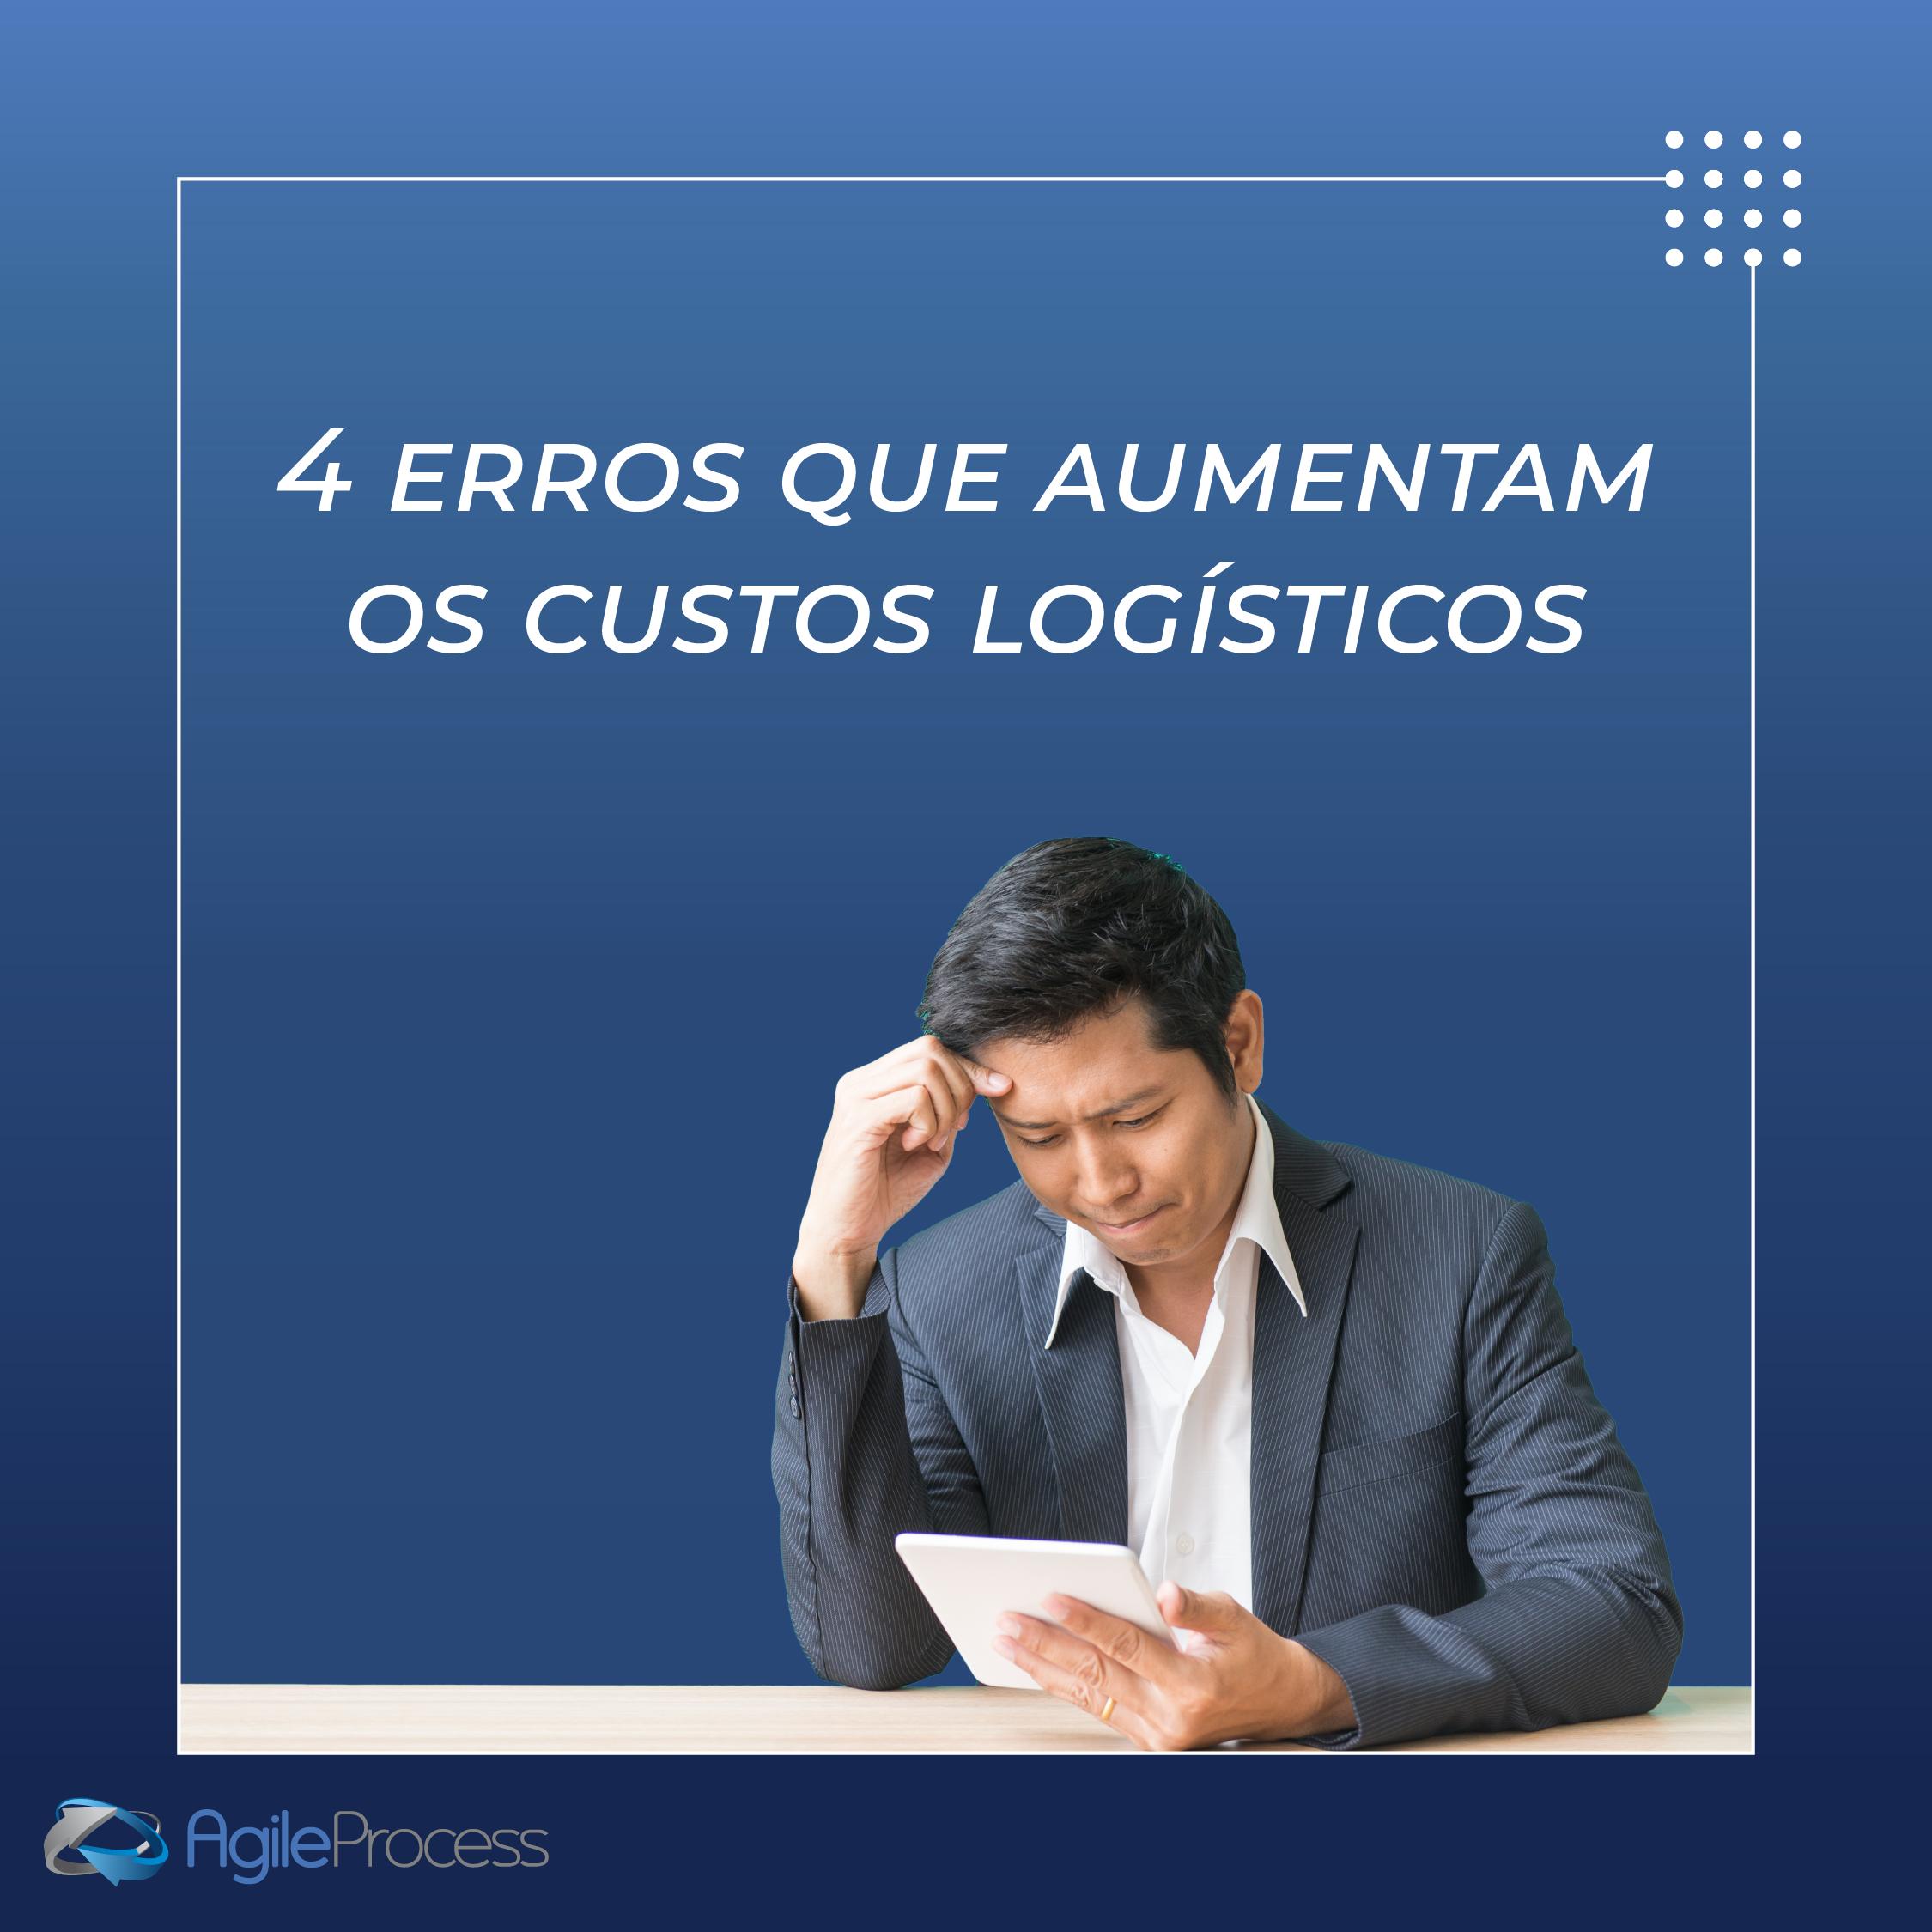 erros aumentam custos logísticos